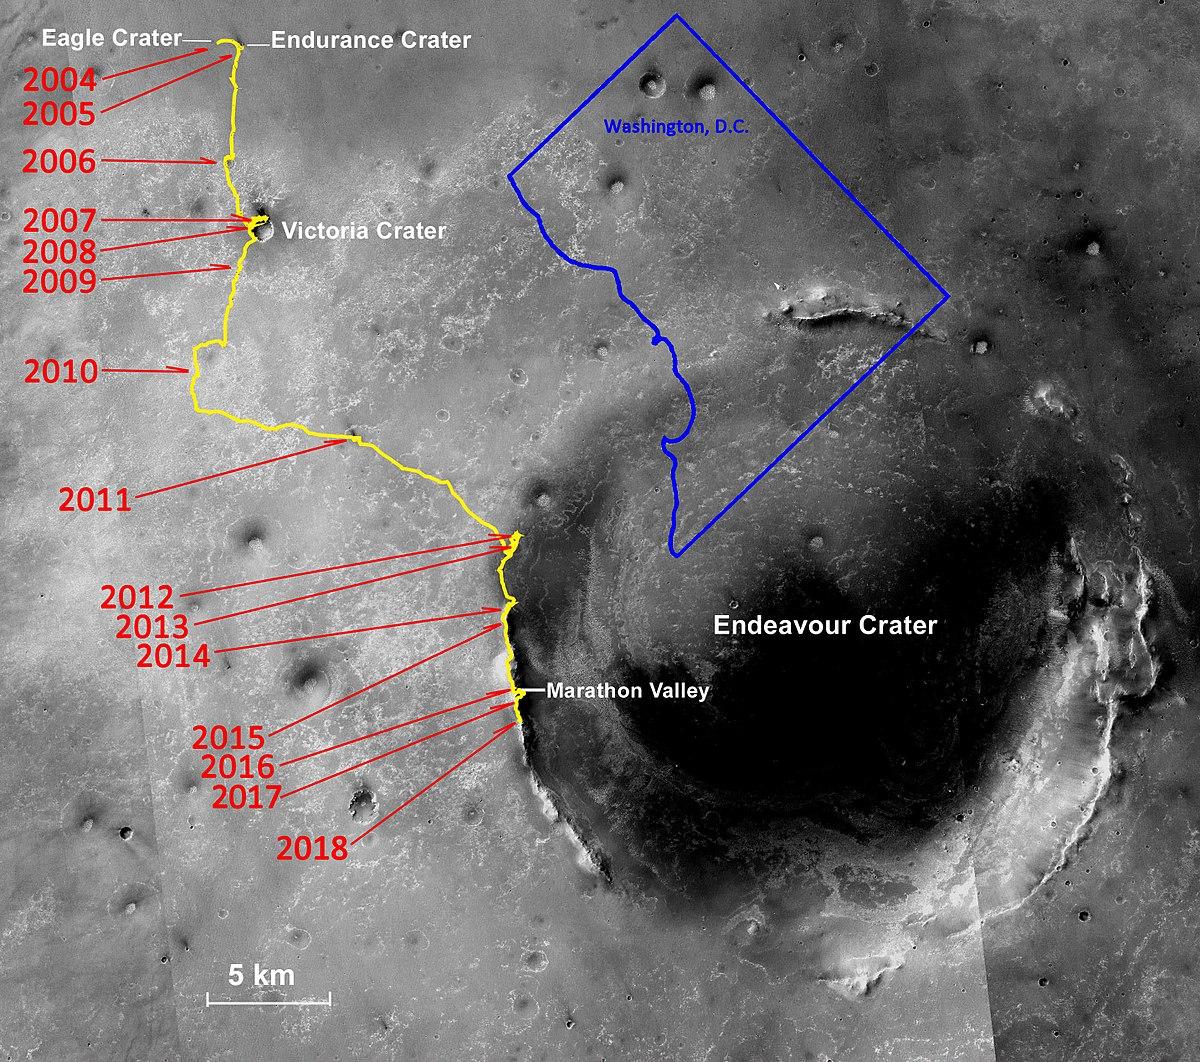 mars opportunity rover bbc - photo #41